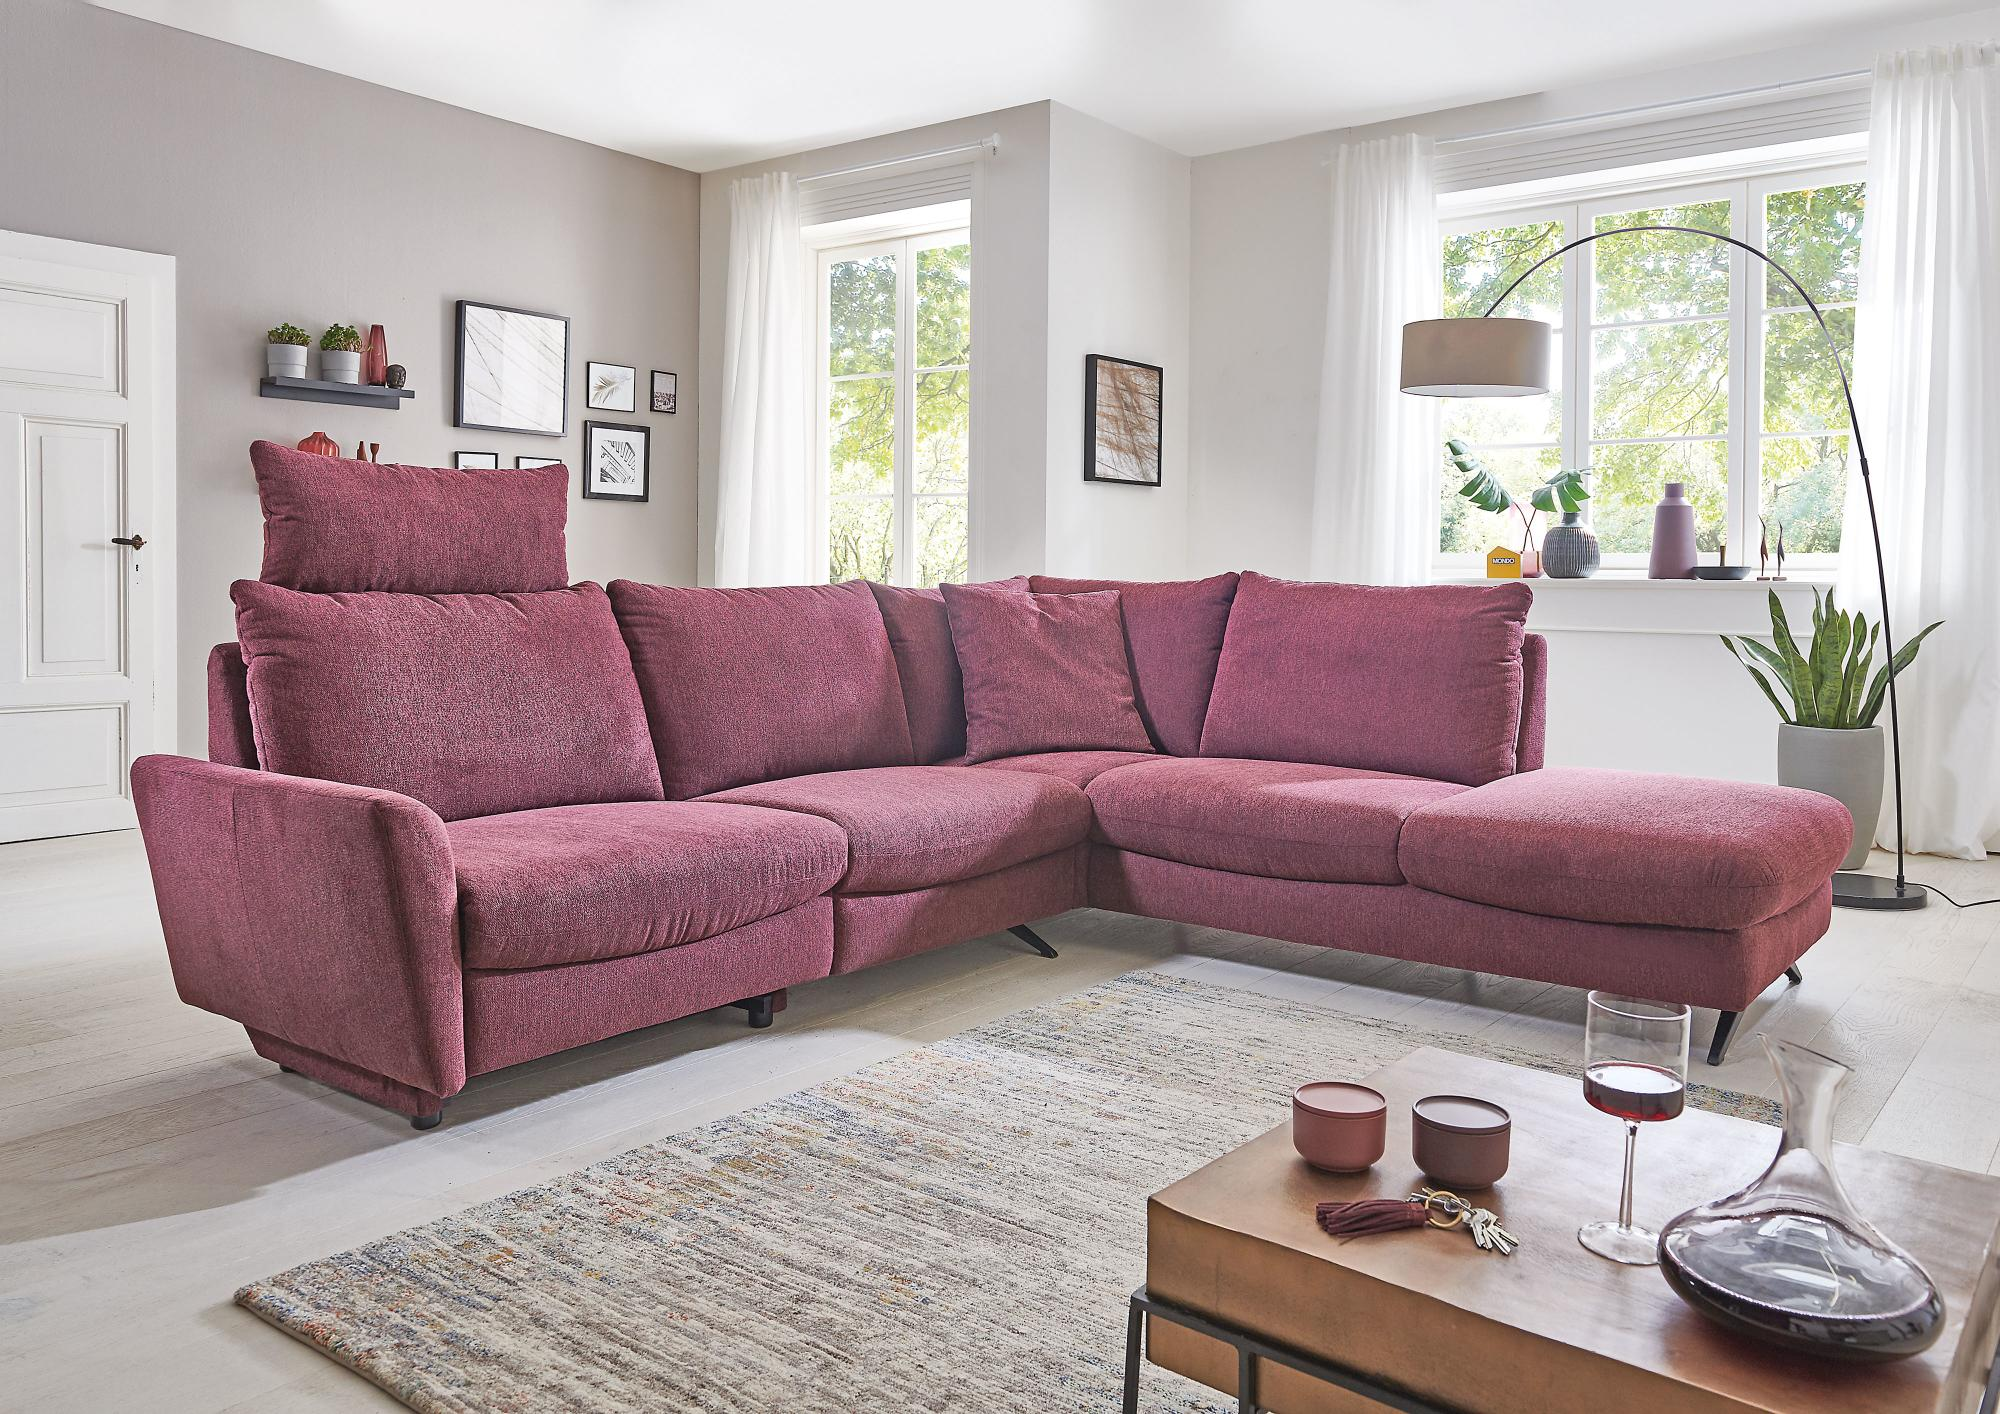 Full Size of Mondo Sofa Kaufen Agata Meble Erfahrungen Brick Bertinoro Couch Leder 1 Bed Softline Mbel Martin Polstergarnitur Navalo Online Boxspring Kunstleder Weiß 3er Sofa Mondo Sofa